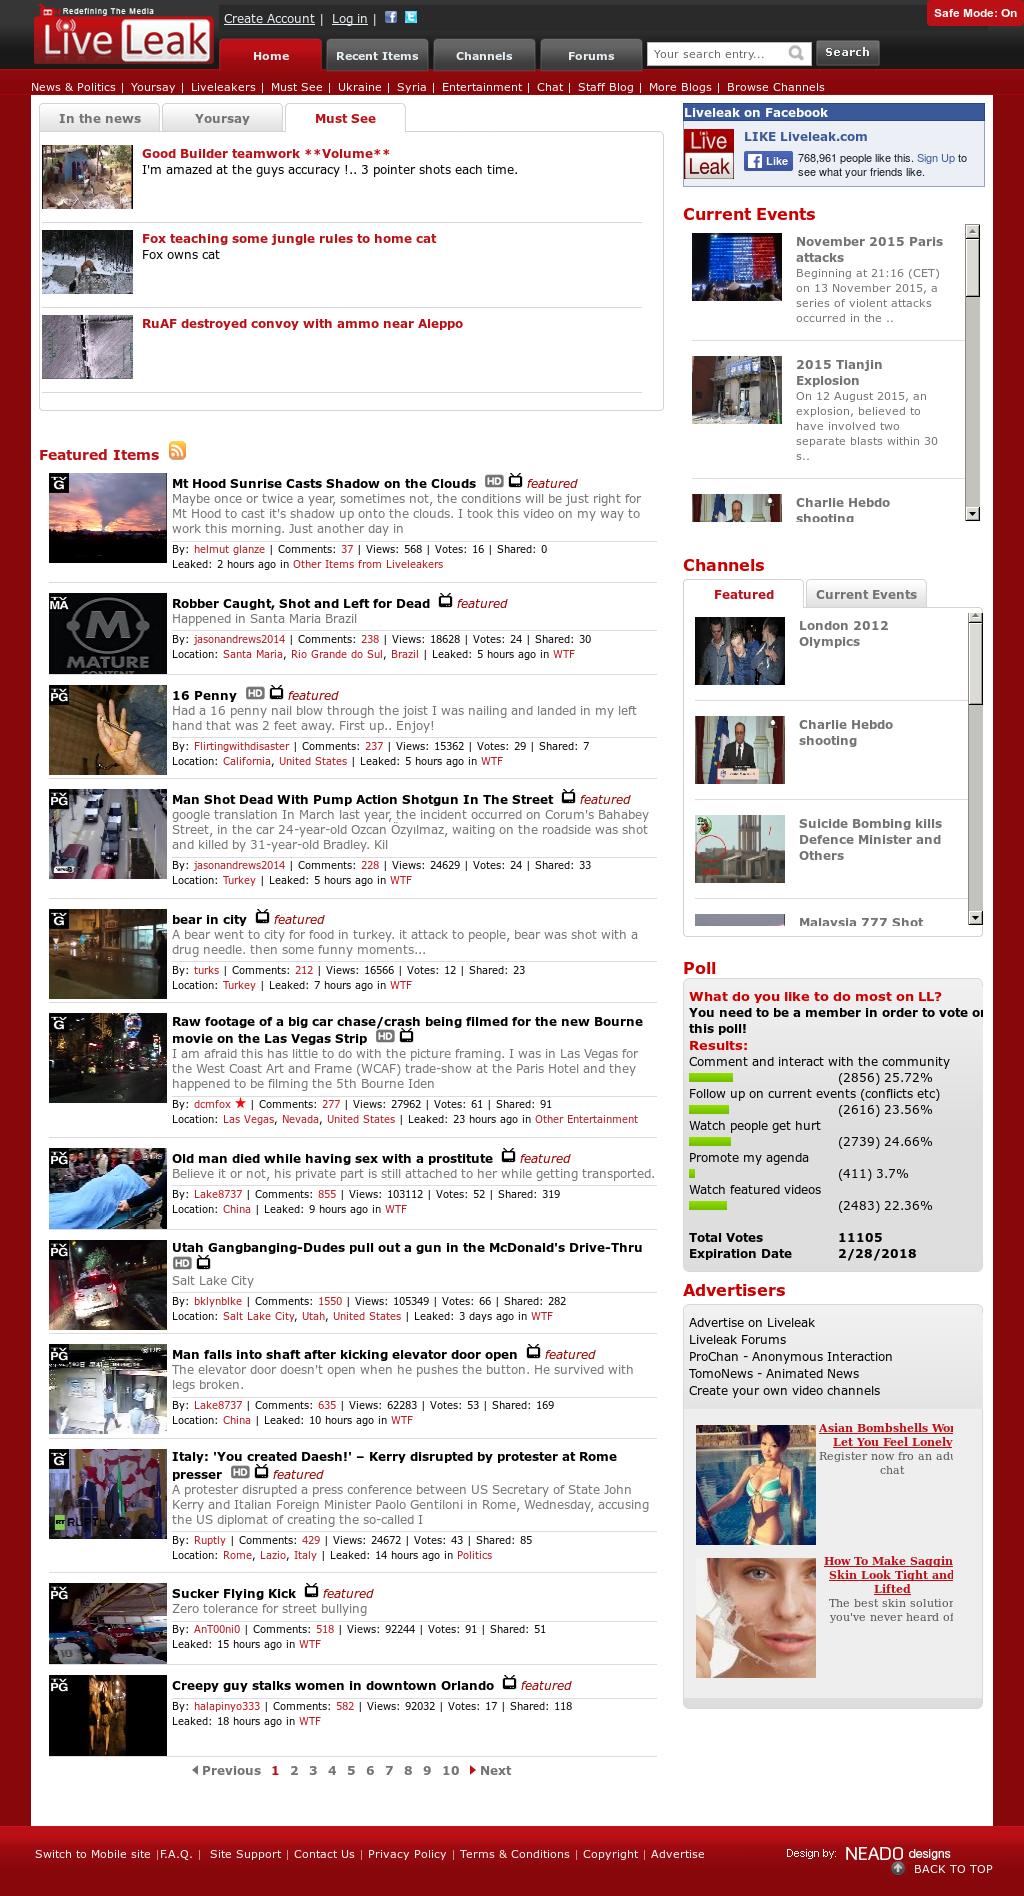 Owler Reports - Liveleak: Q&A: The Man Behind LiveLeak, The